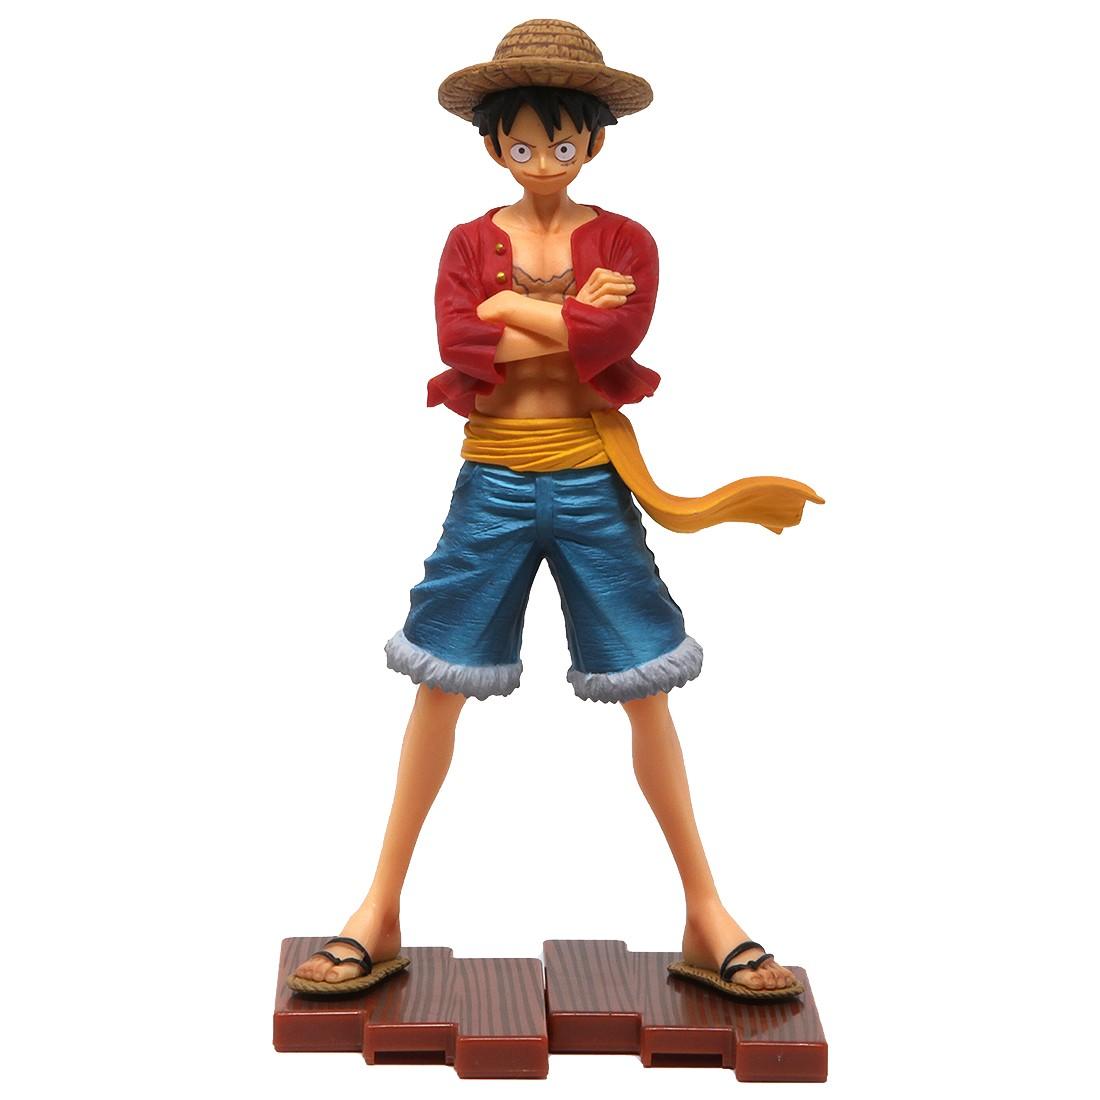 Bandai Figuarts Zero One Piece Straw Hat Luffy Figure (red)